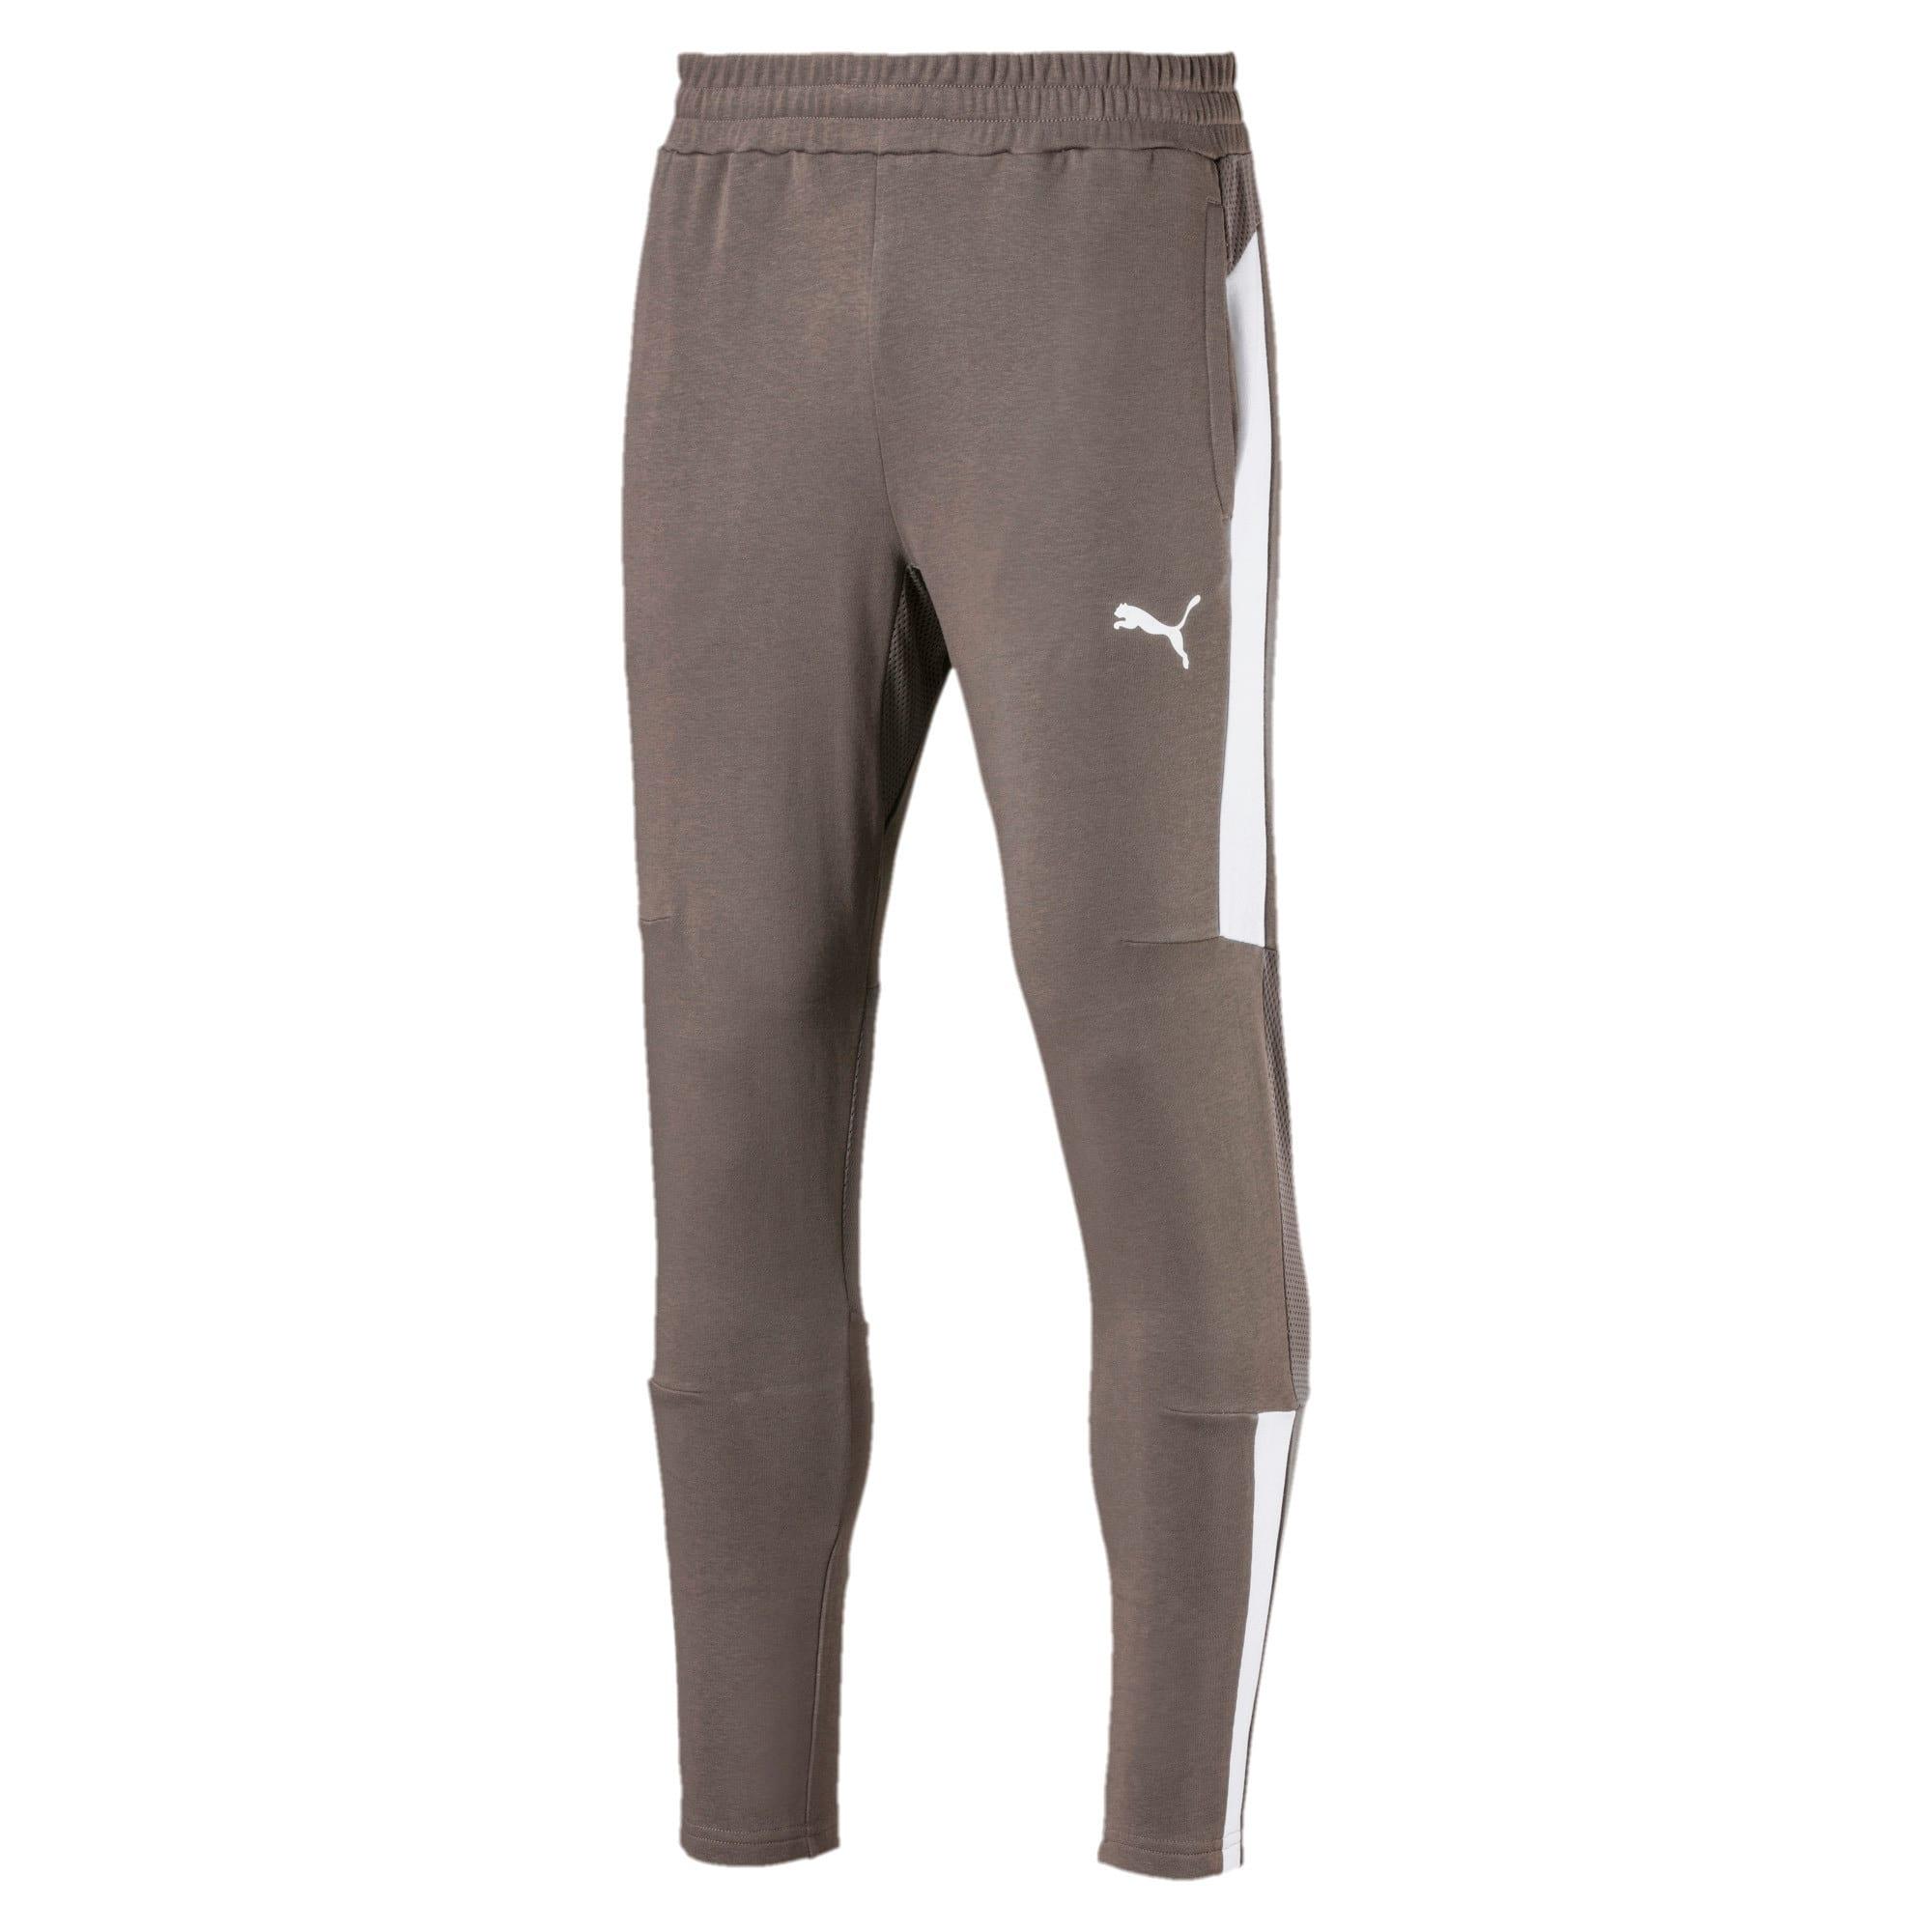 Thumbnail 1 of Energy Sweat Blaster Men's Pants, Charcoal Gray-Puma White, medium